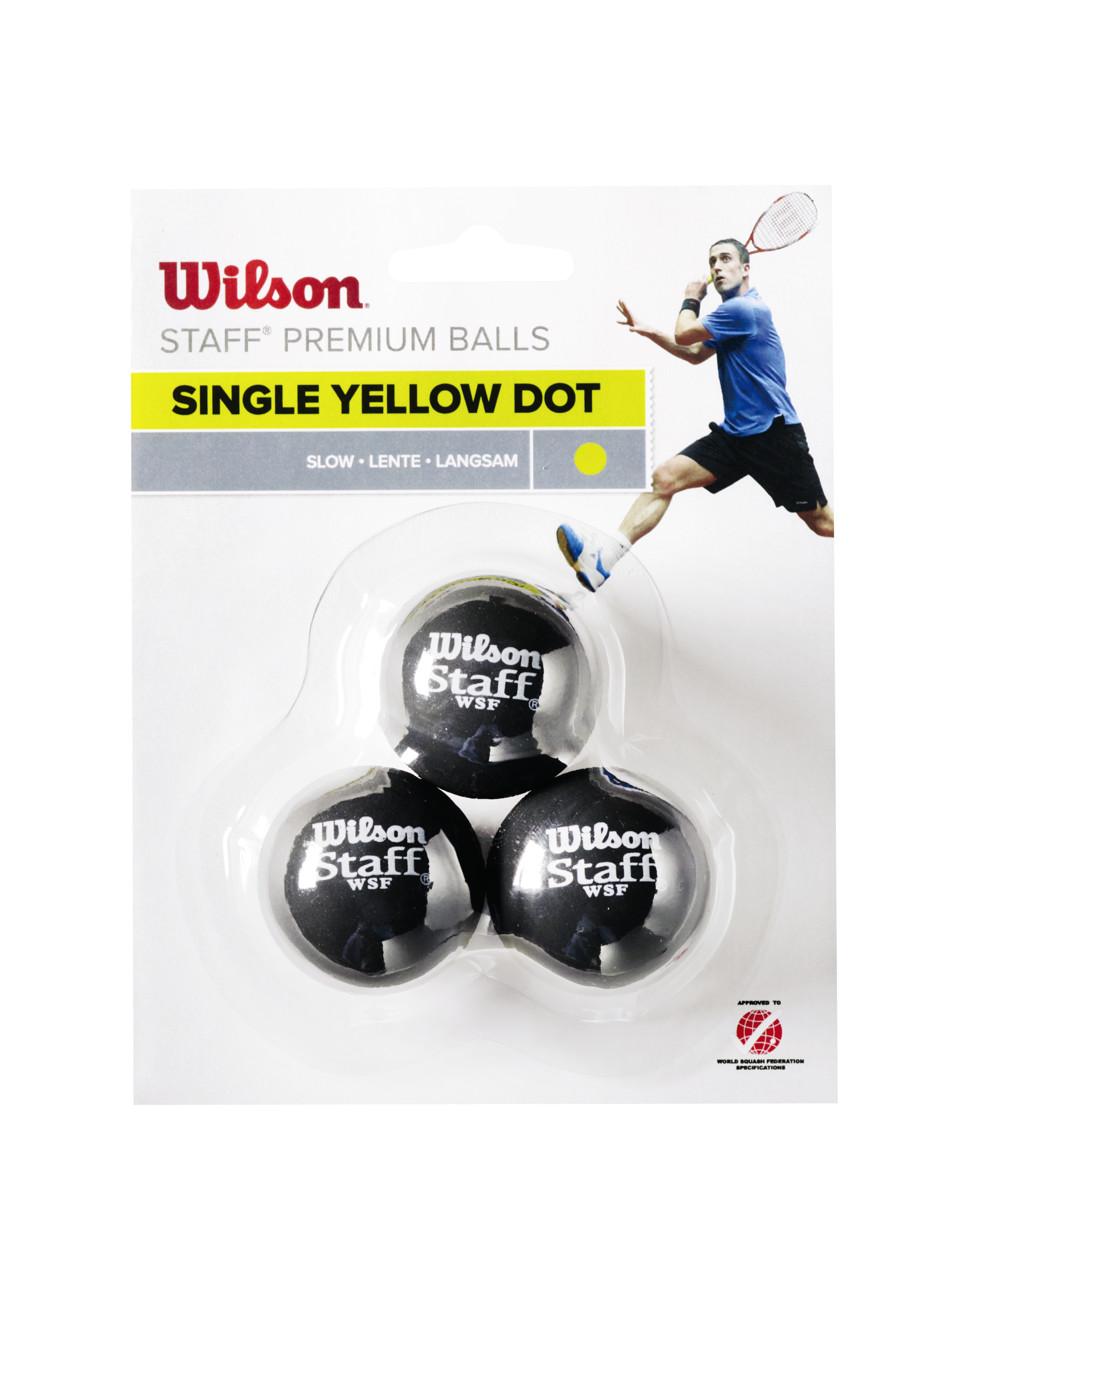 WILSON STAFF SQUASH 3 BALL YEL DOT